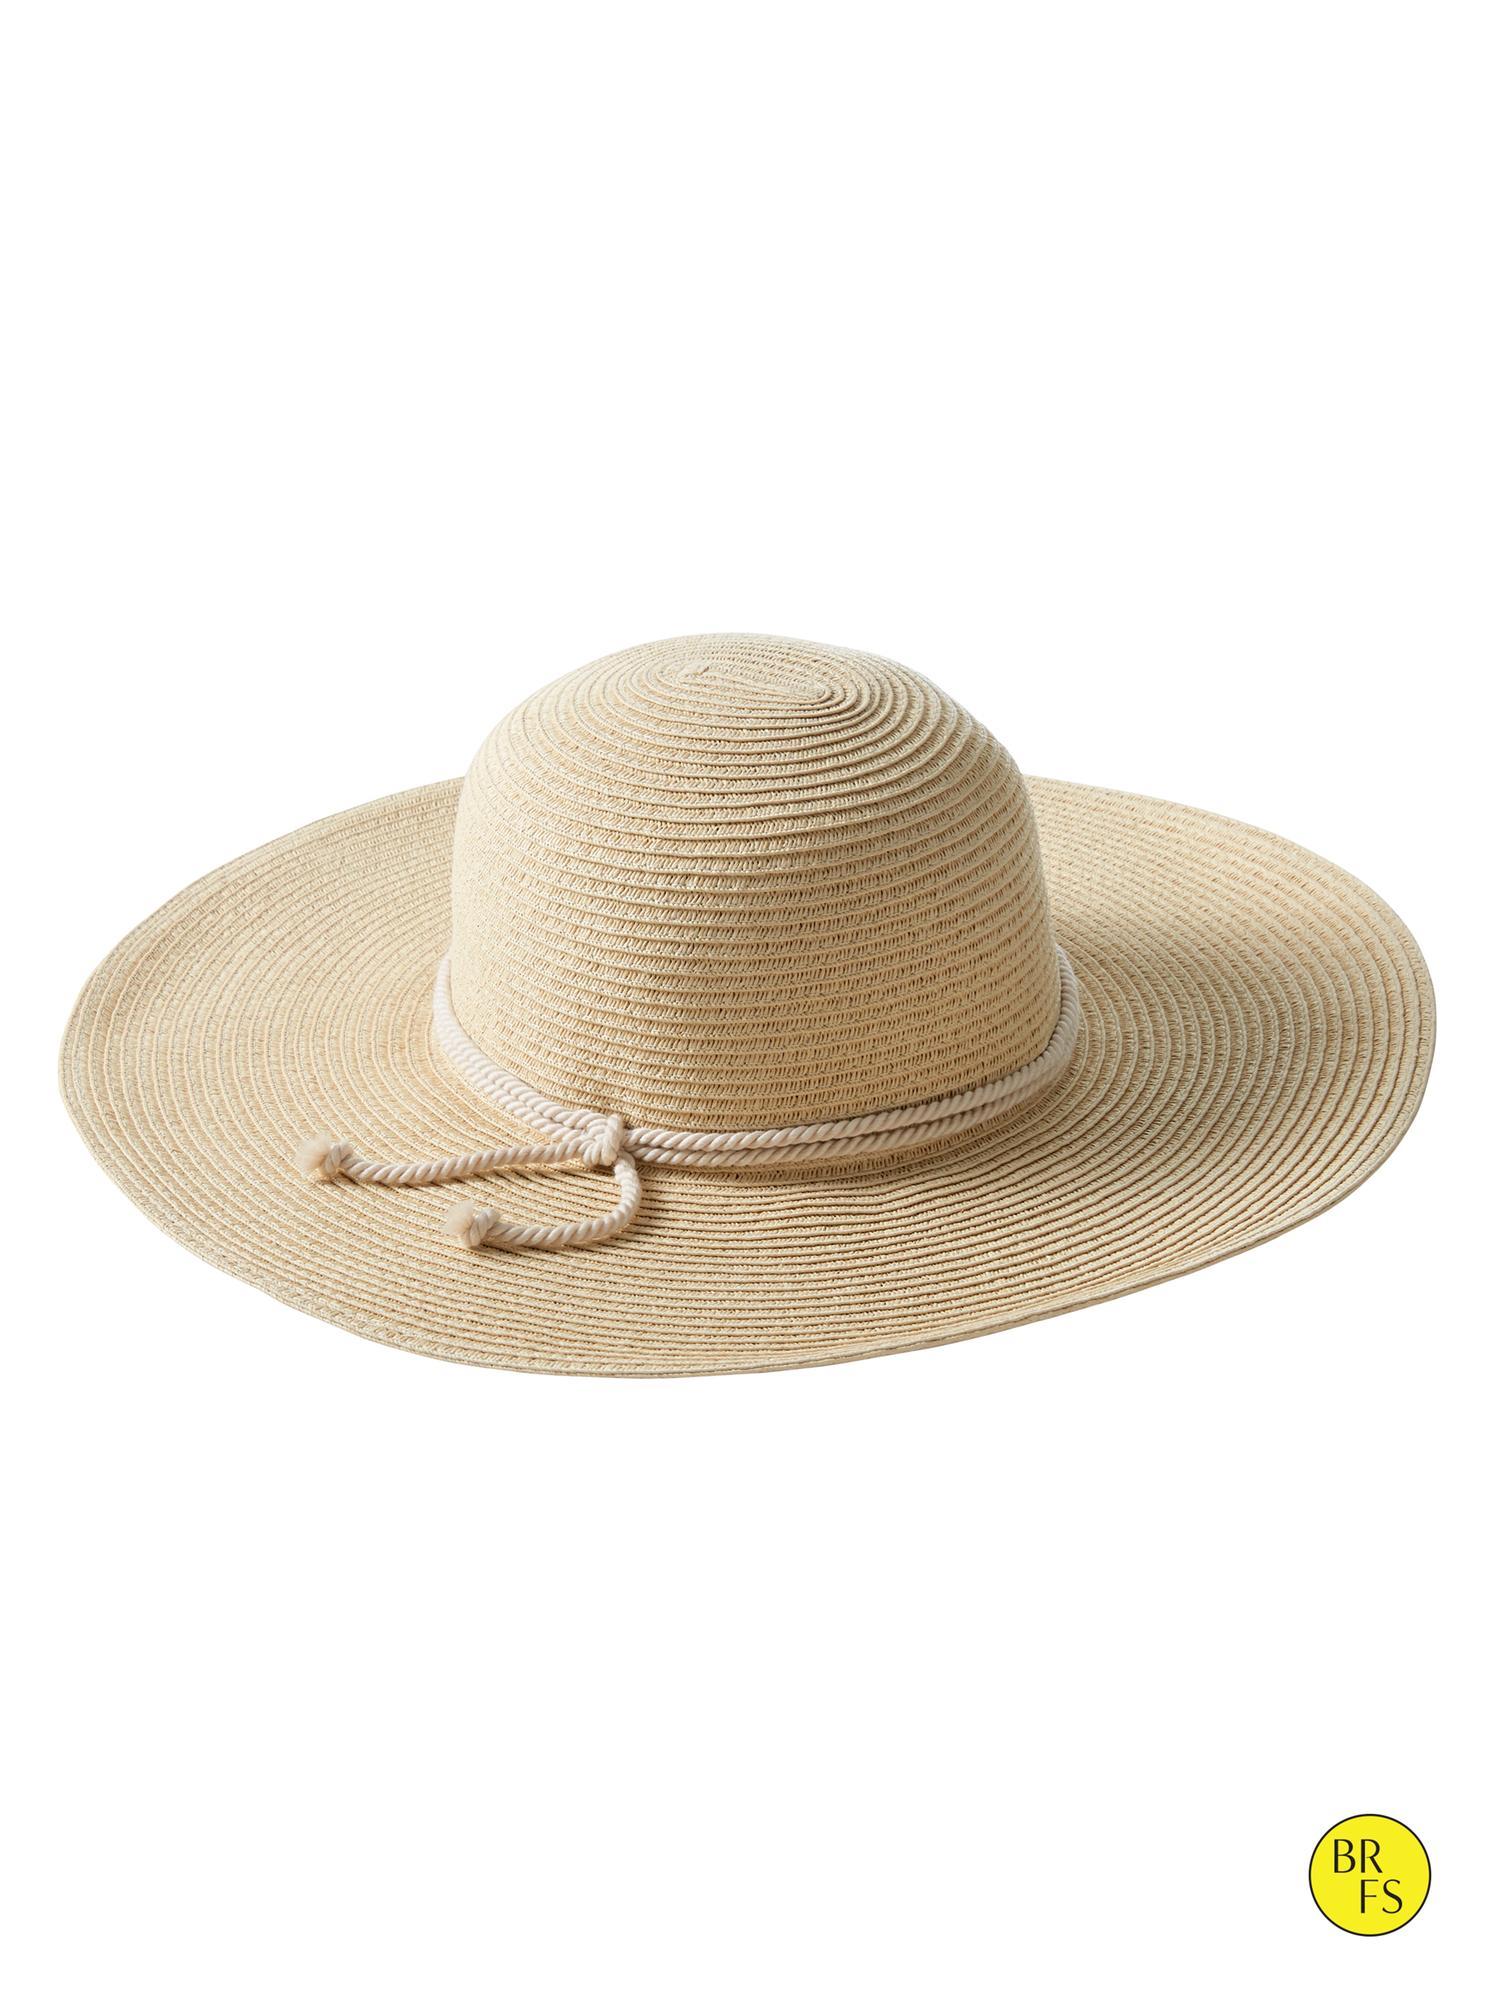 Banana Republic Factory Sun Hat In Beige Natural Lyst